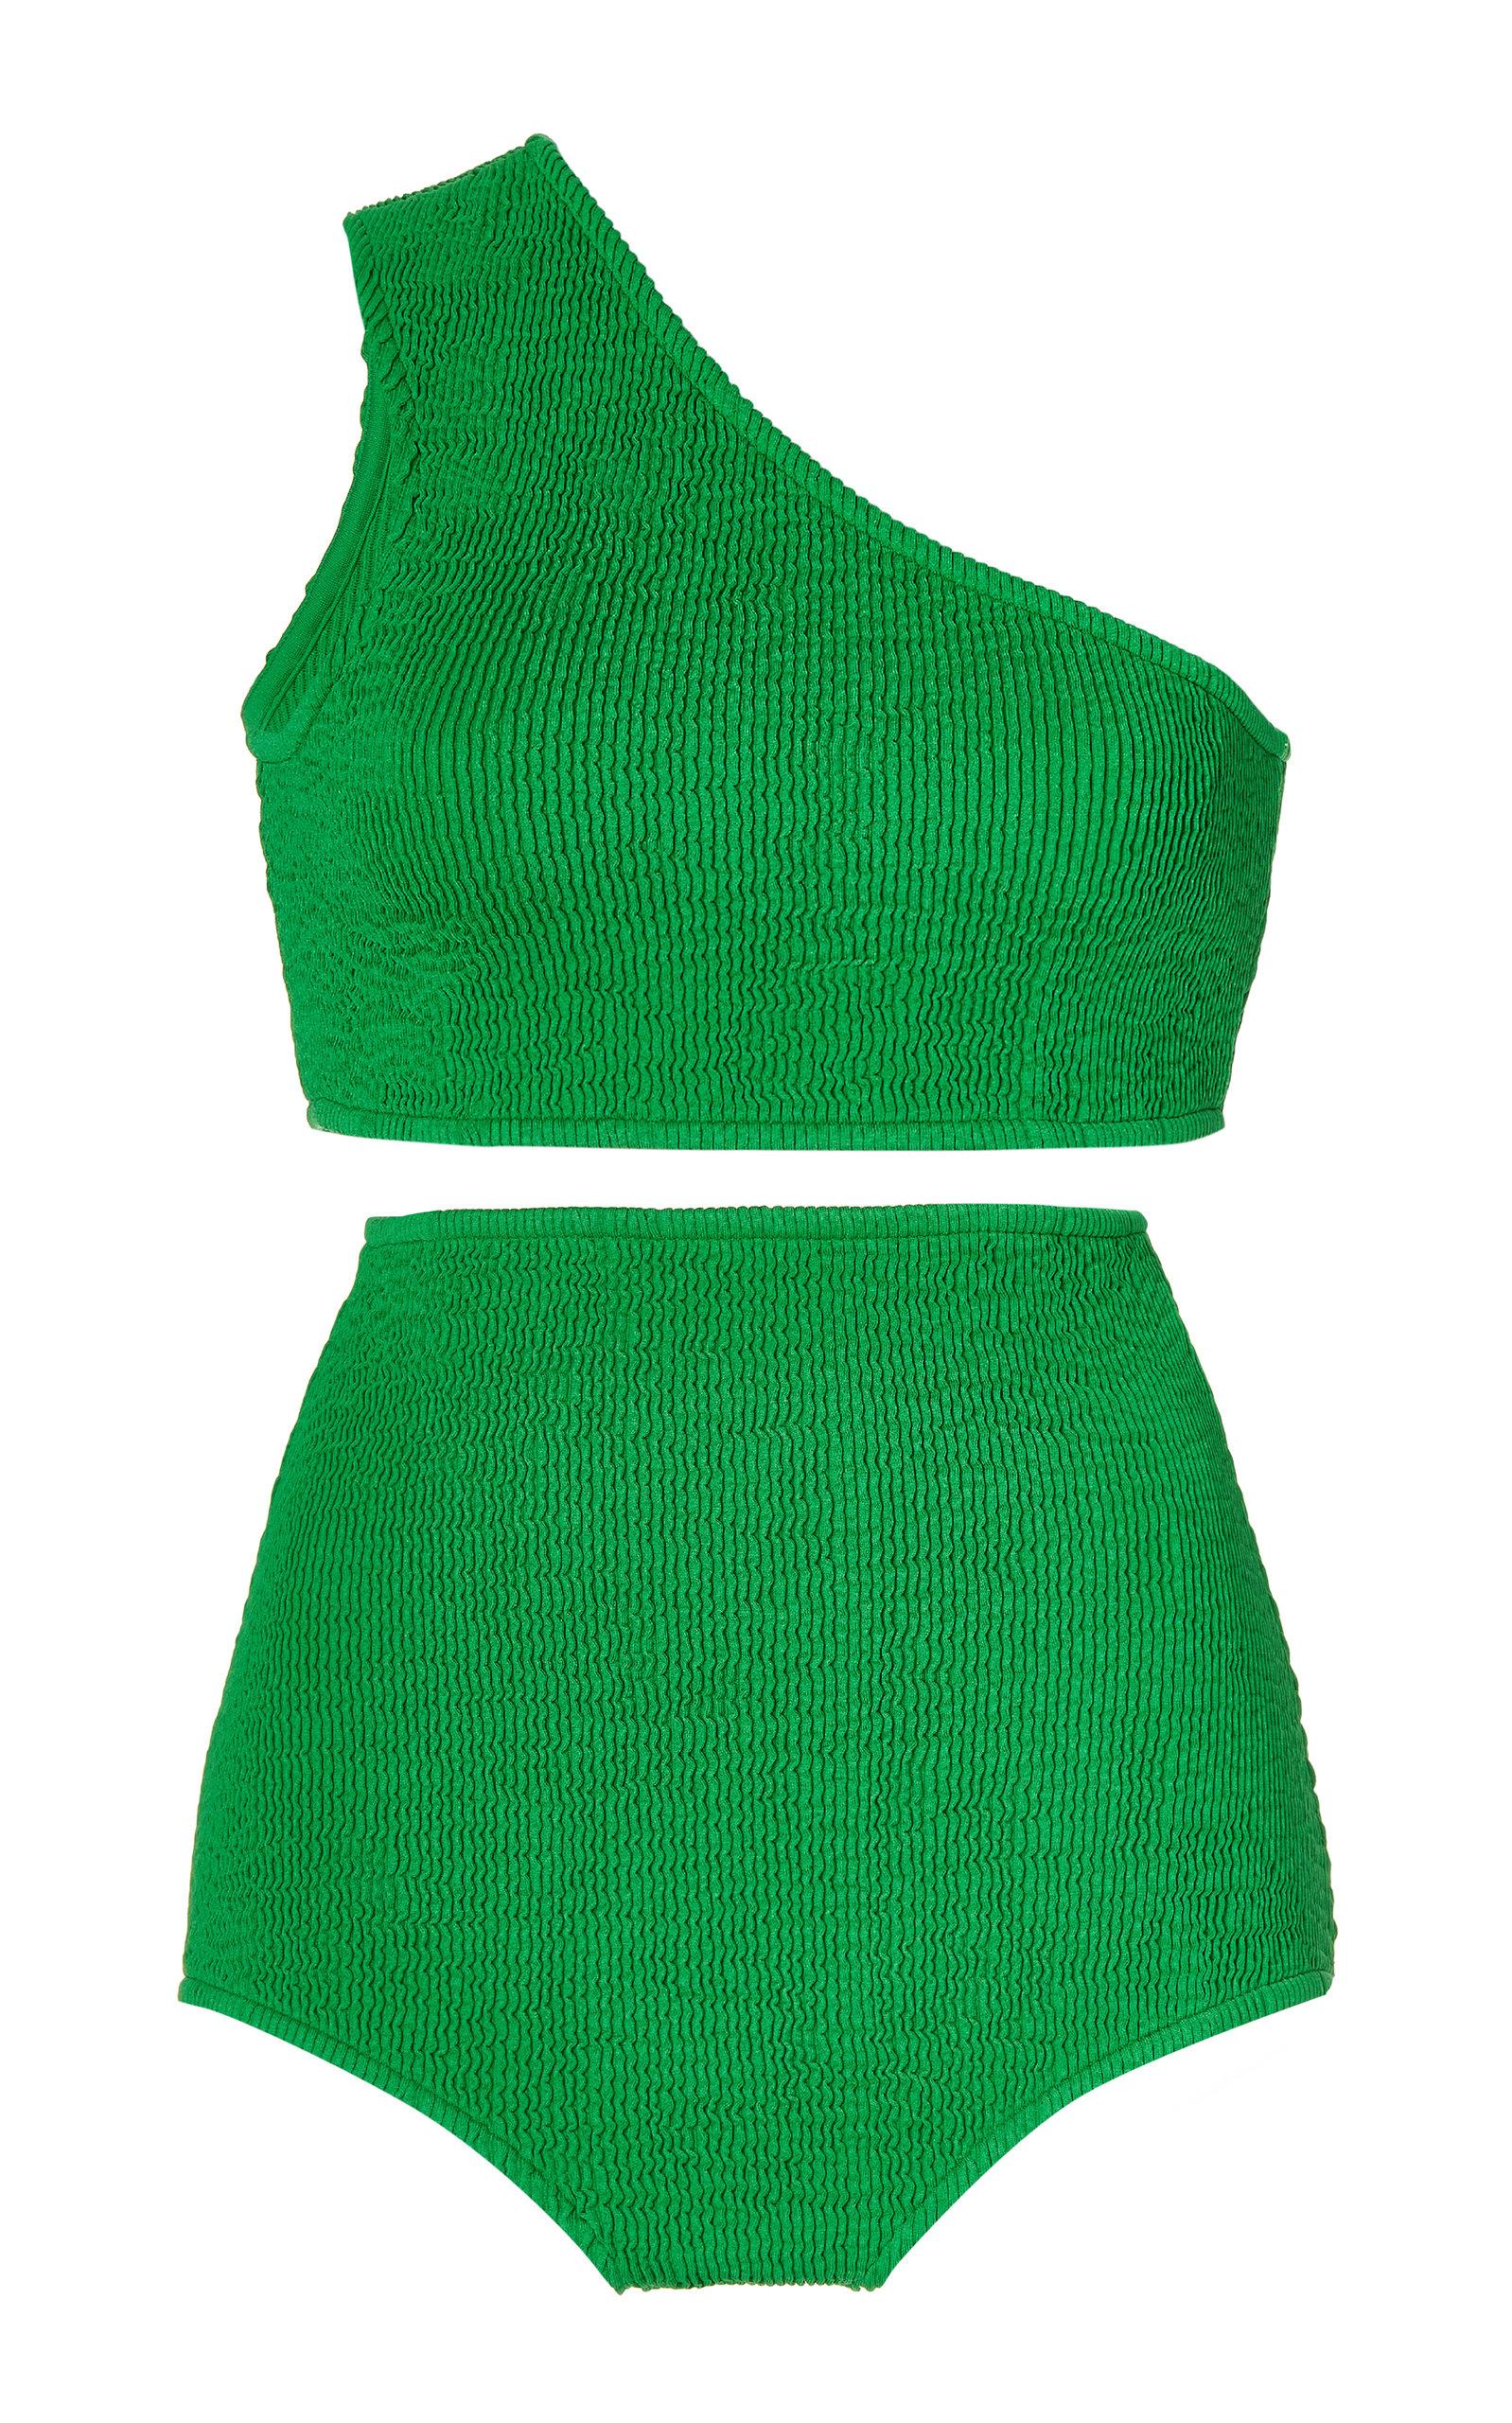 Bottega Veneta - Women's Crinkled One-Shoulder High-Rise Bikini - Green - Moda Operandi